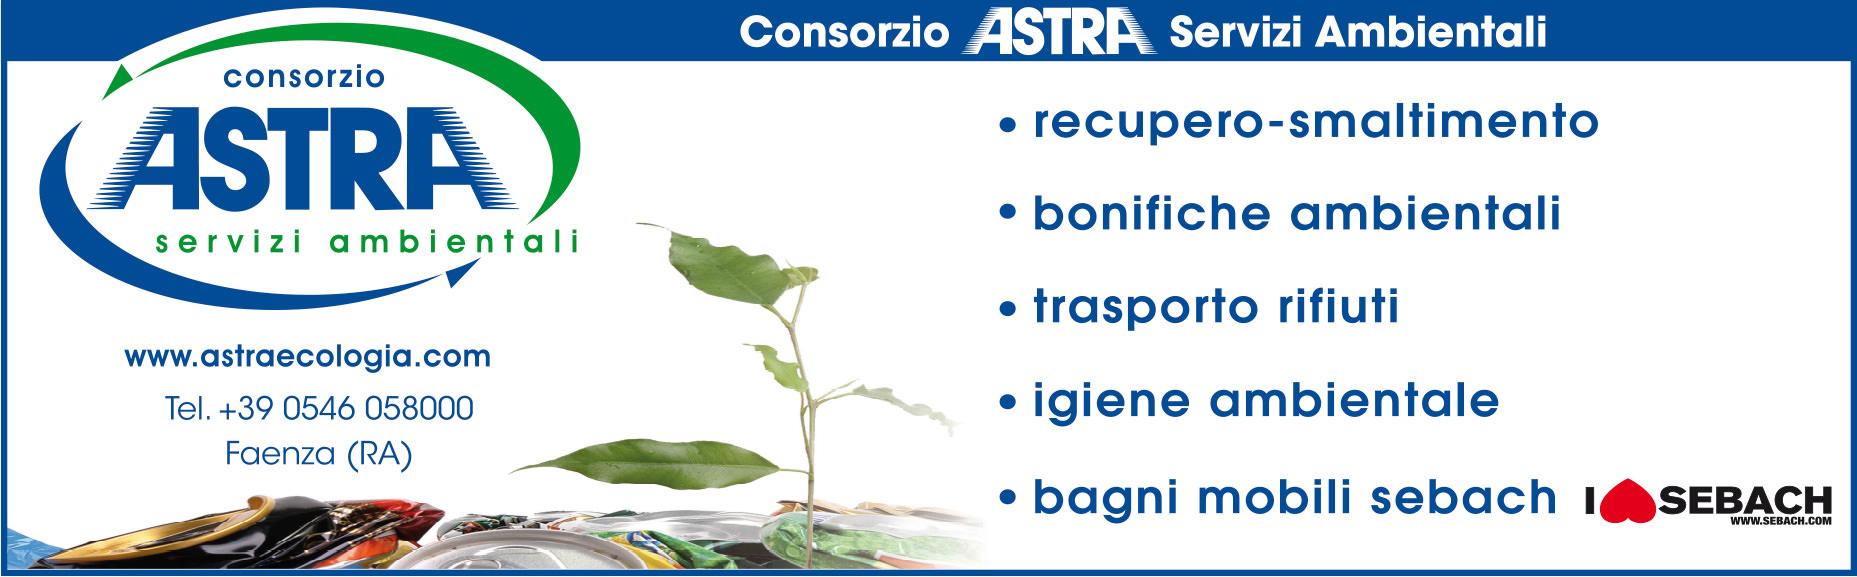 https://astraecologia.com/wp-content/uploads/2021/01/Astra-Banner-2.jpg